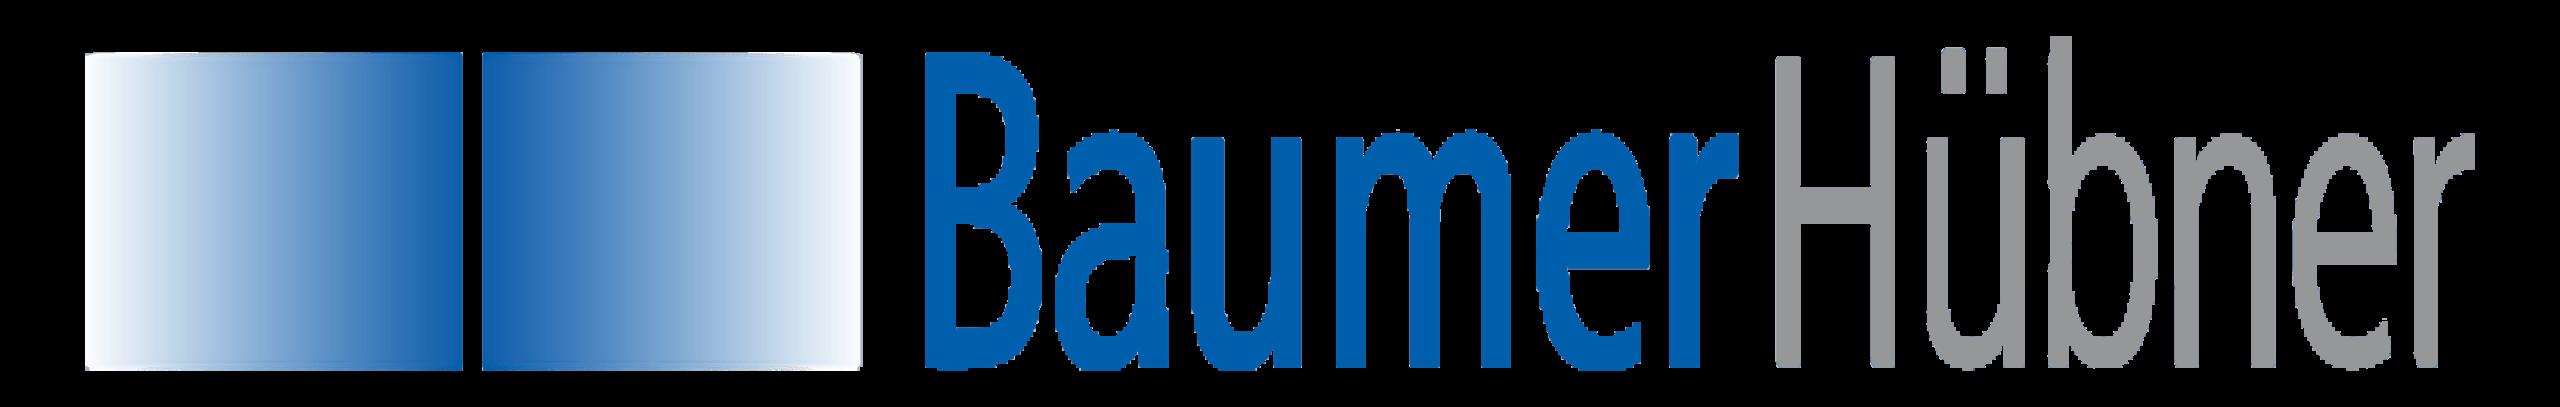 Baumer-Hubner